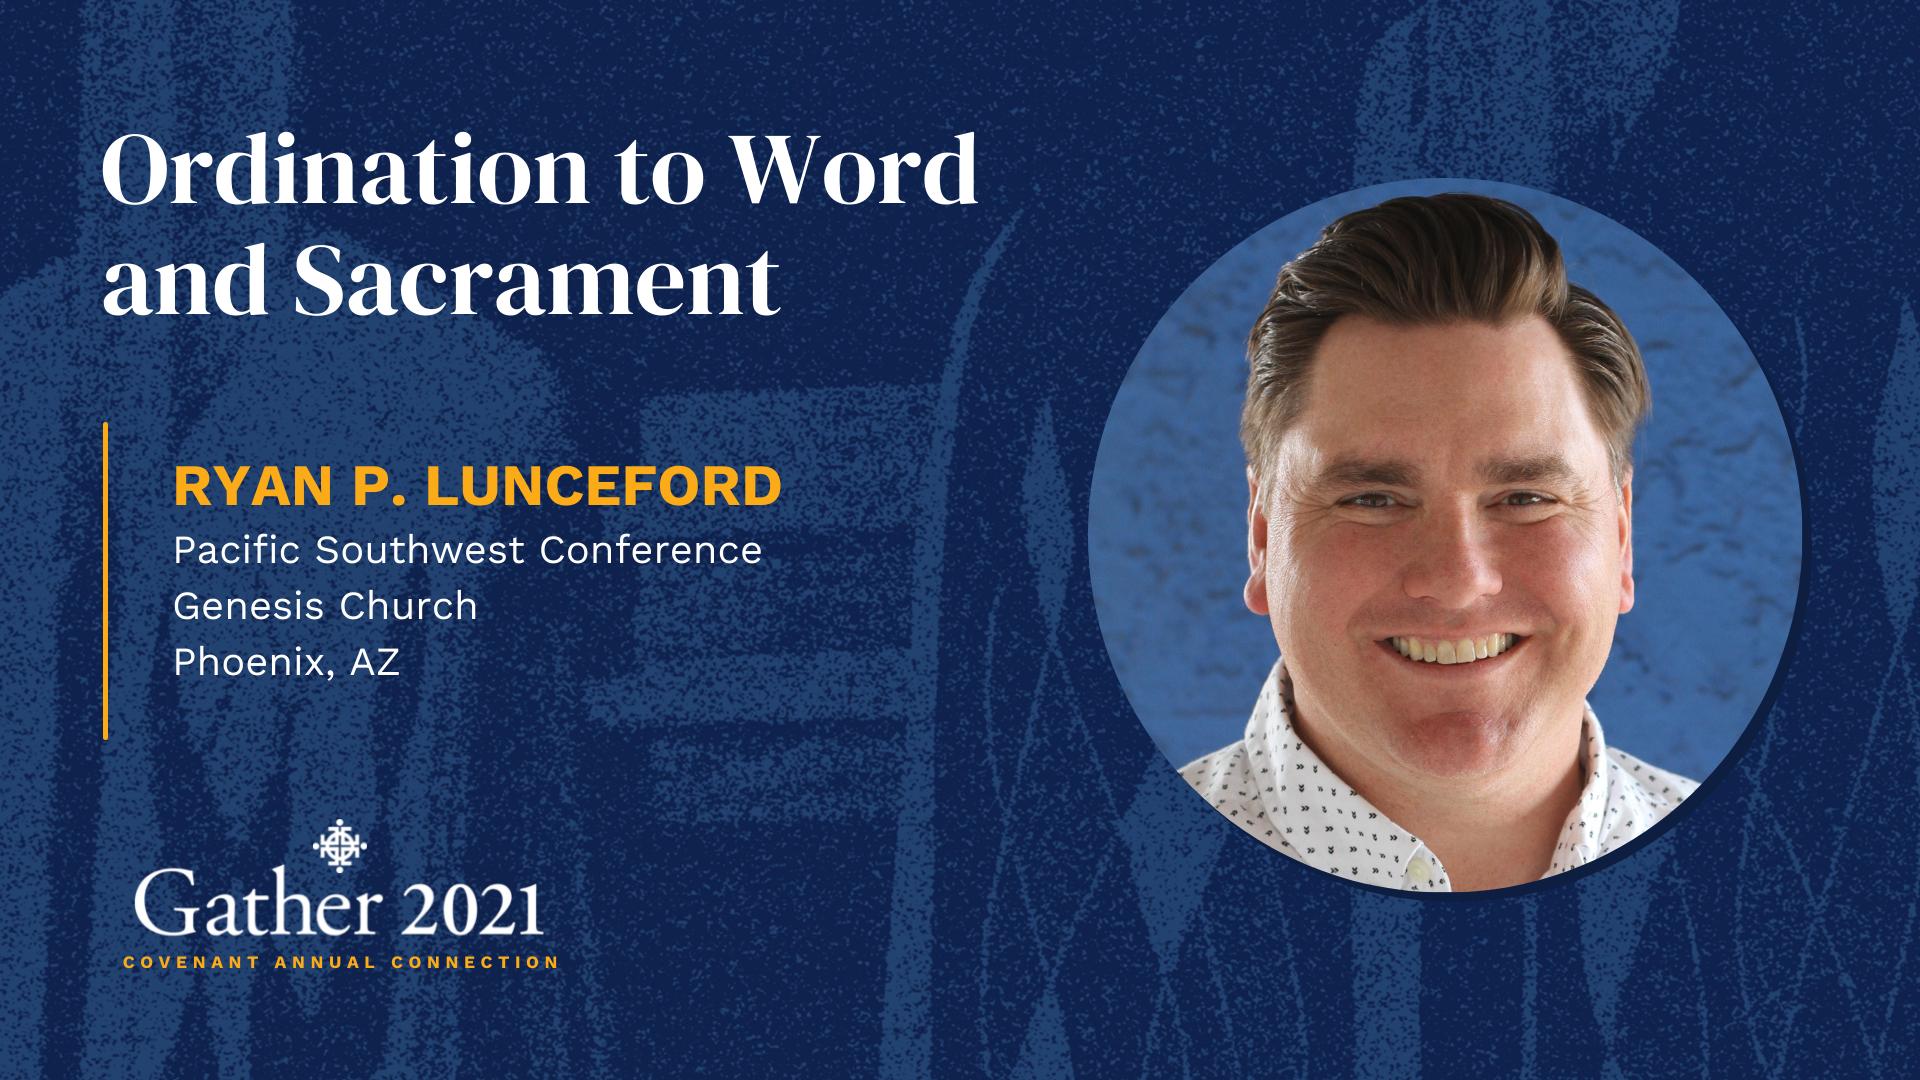 Ryan P. Lunceford